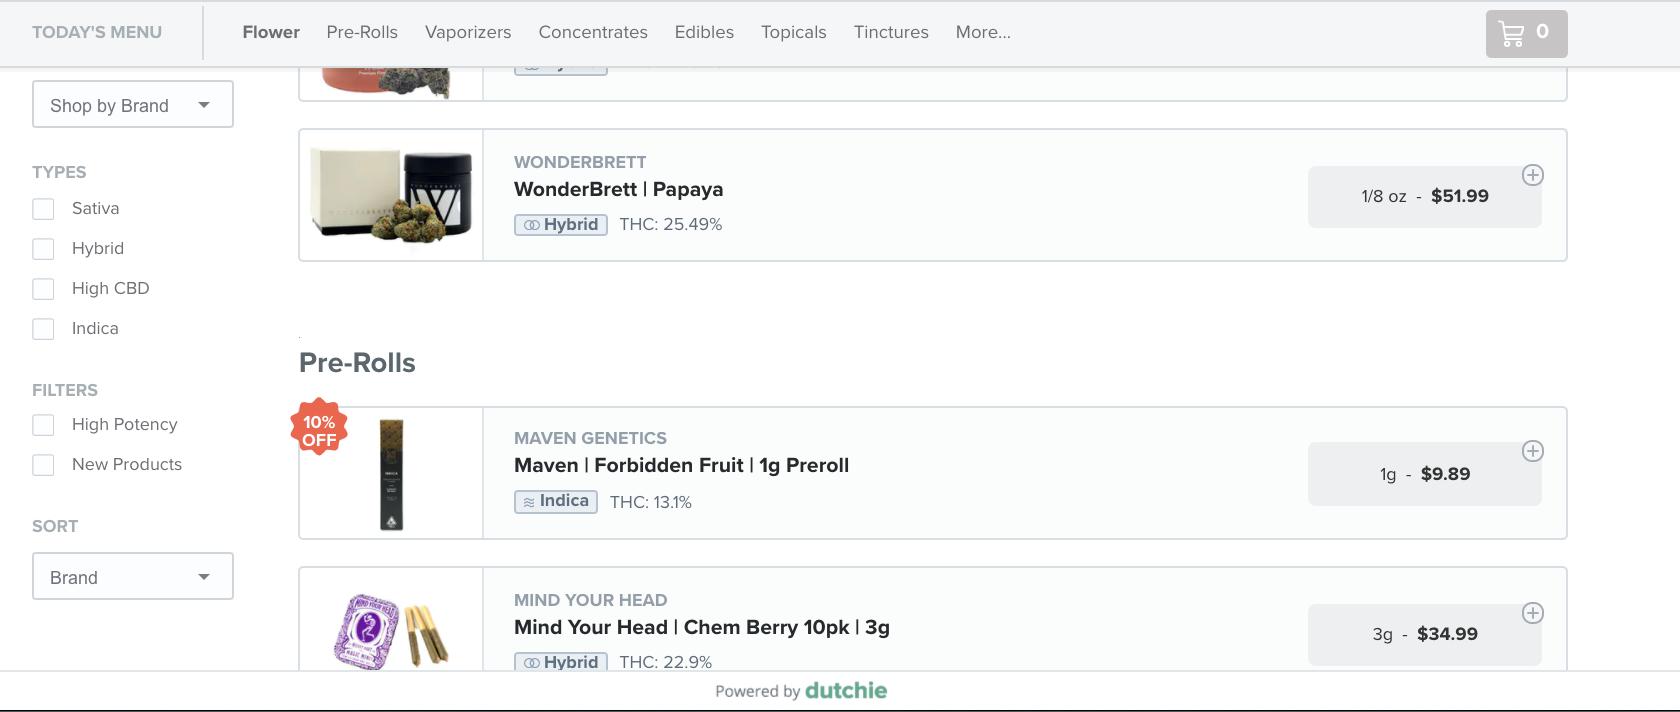 screenshot showing dutchie menu on cannabis dispensary website